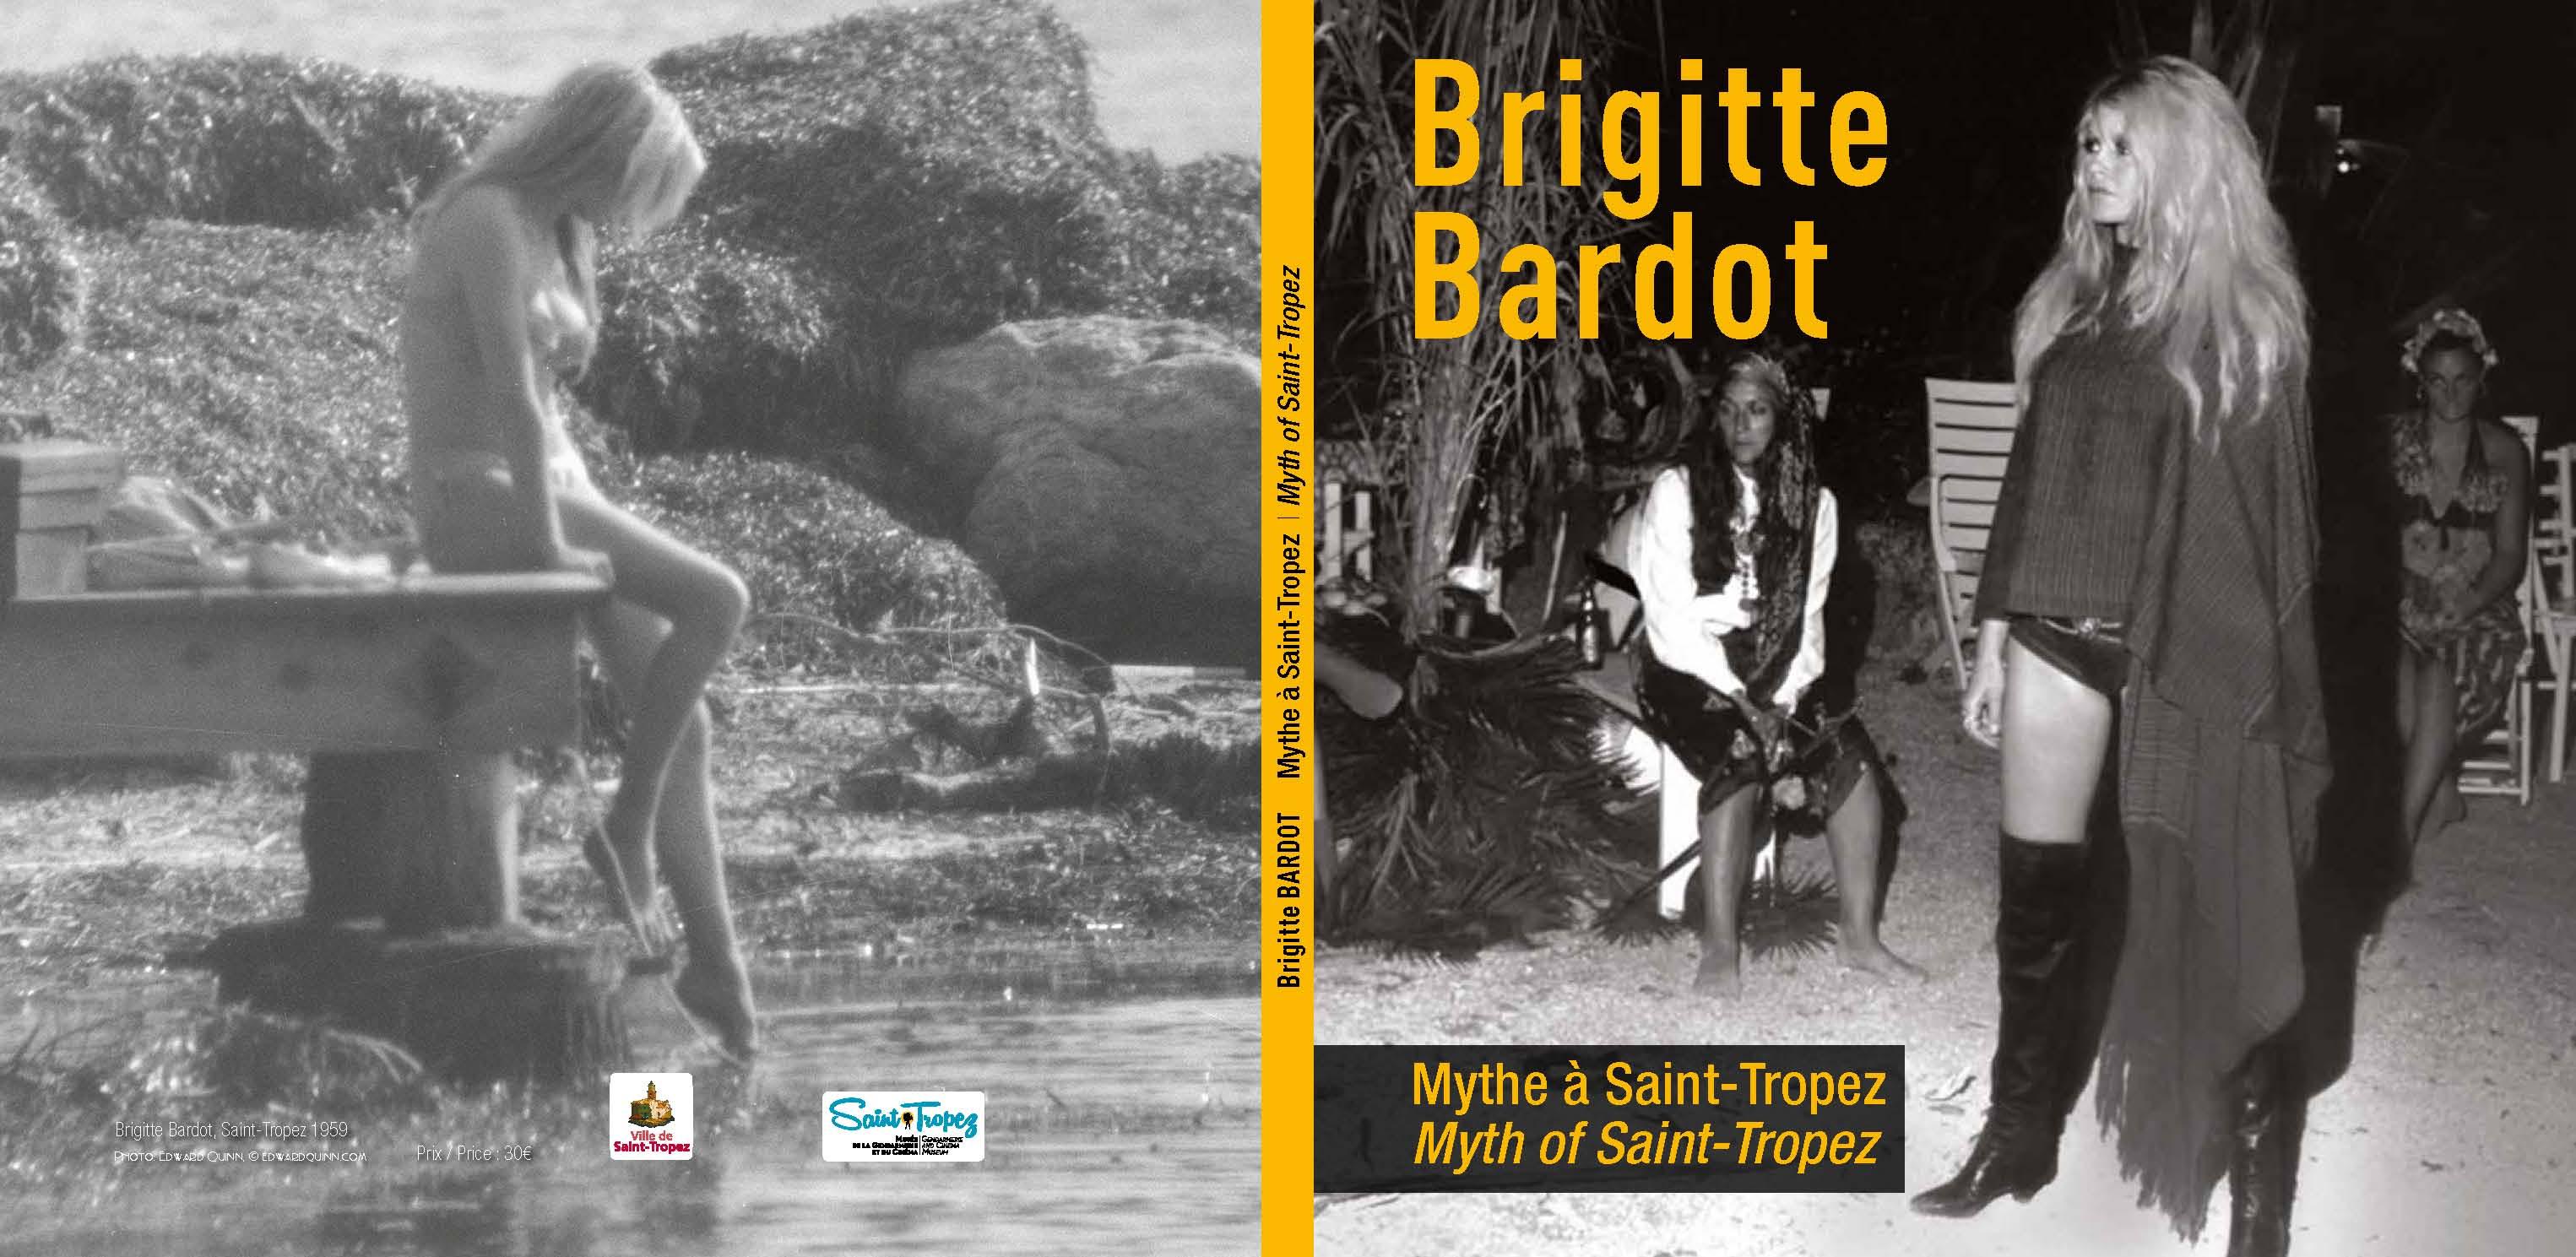 catalogue brigitte bardot